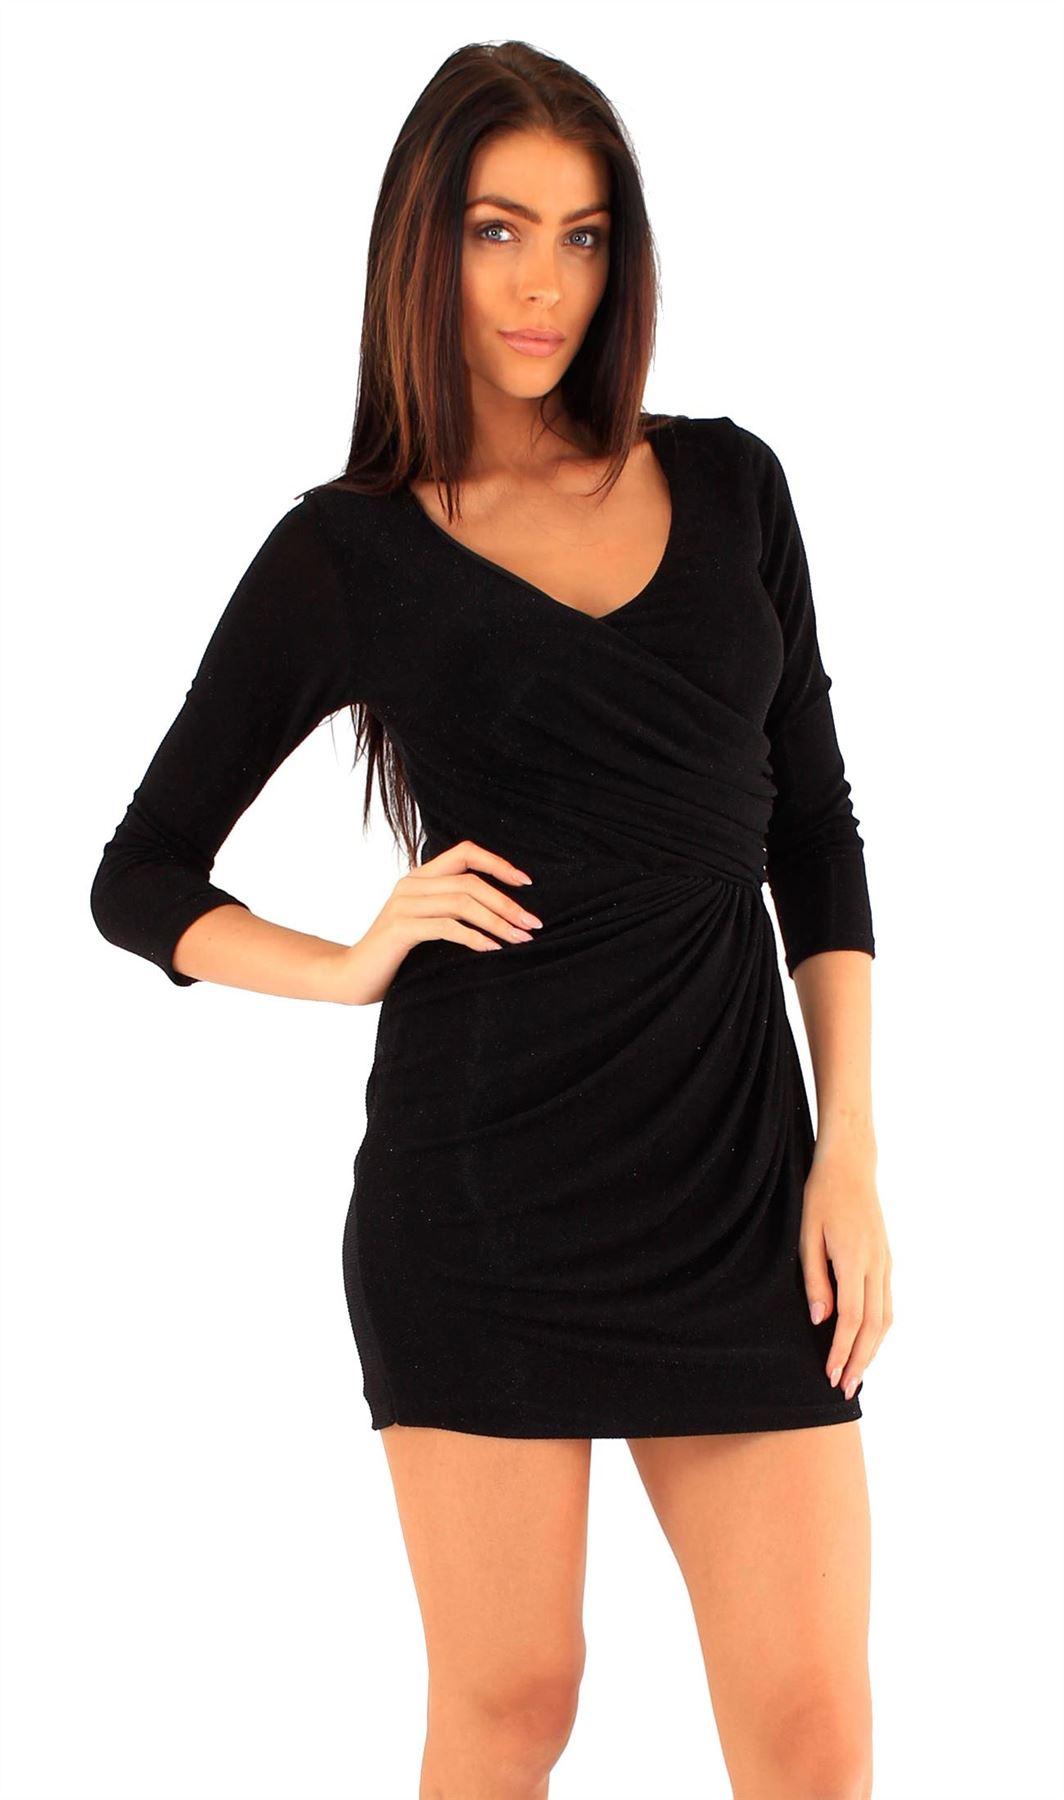 plus size going out dresses australia images